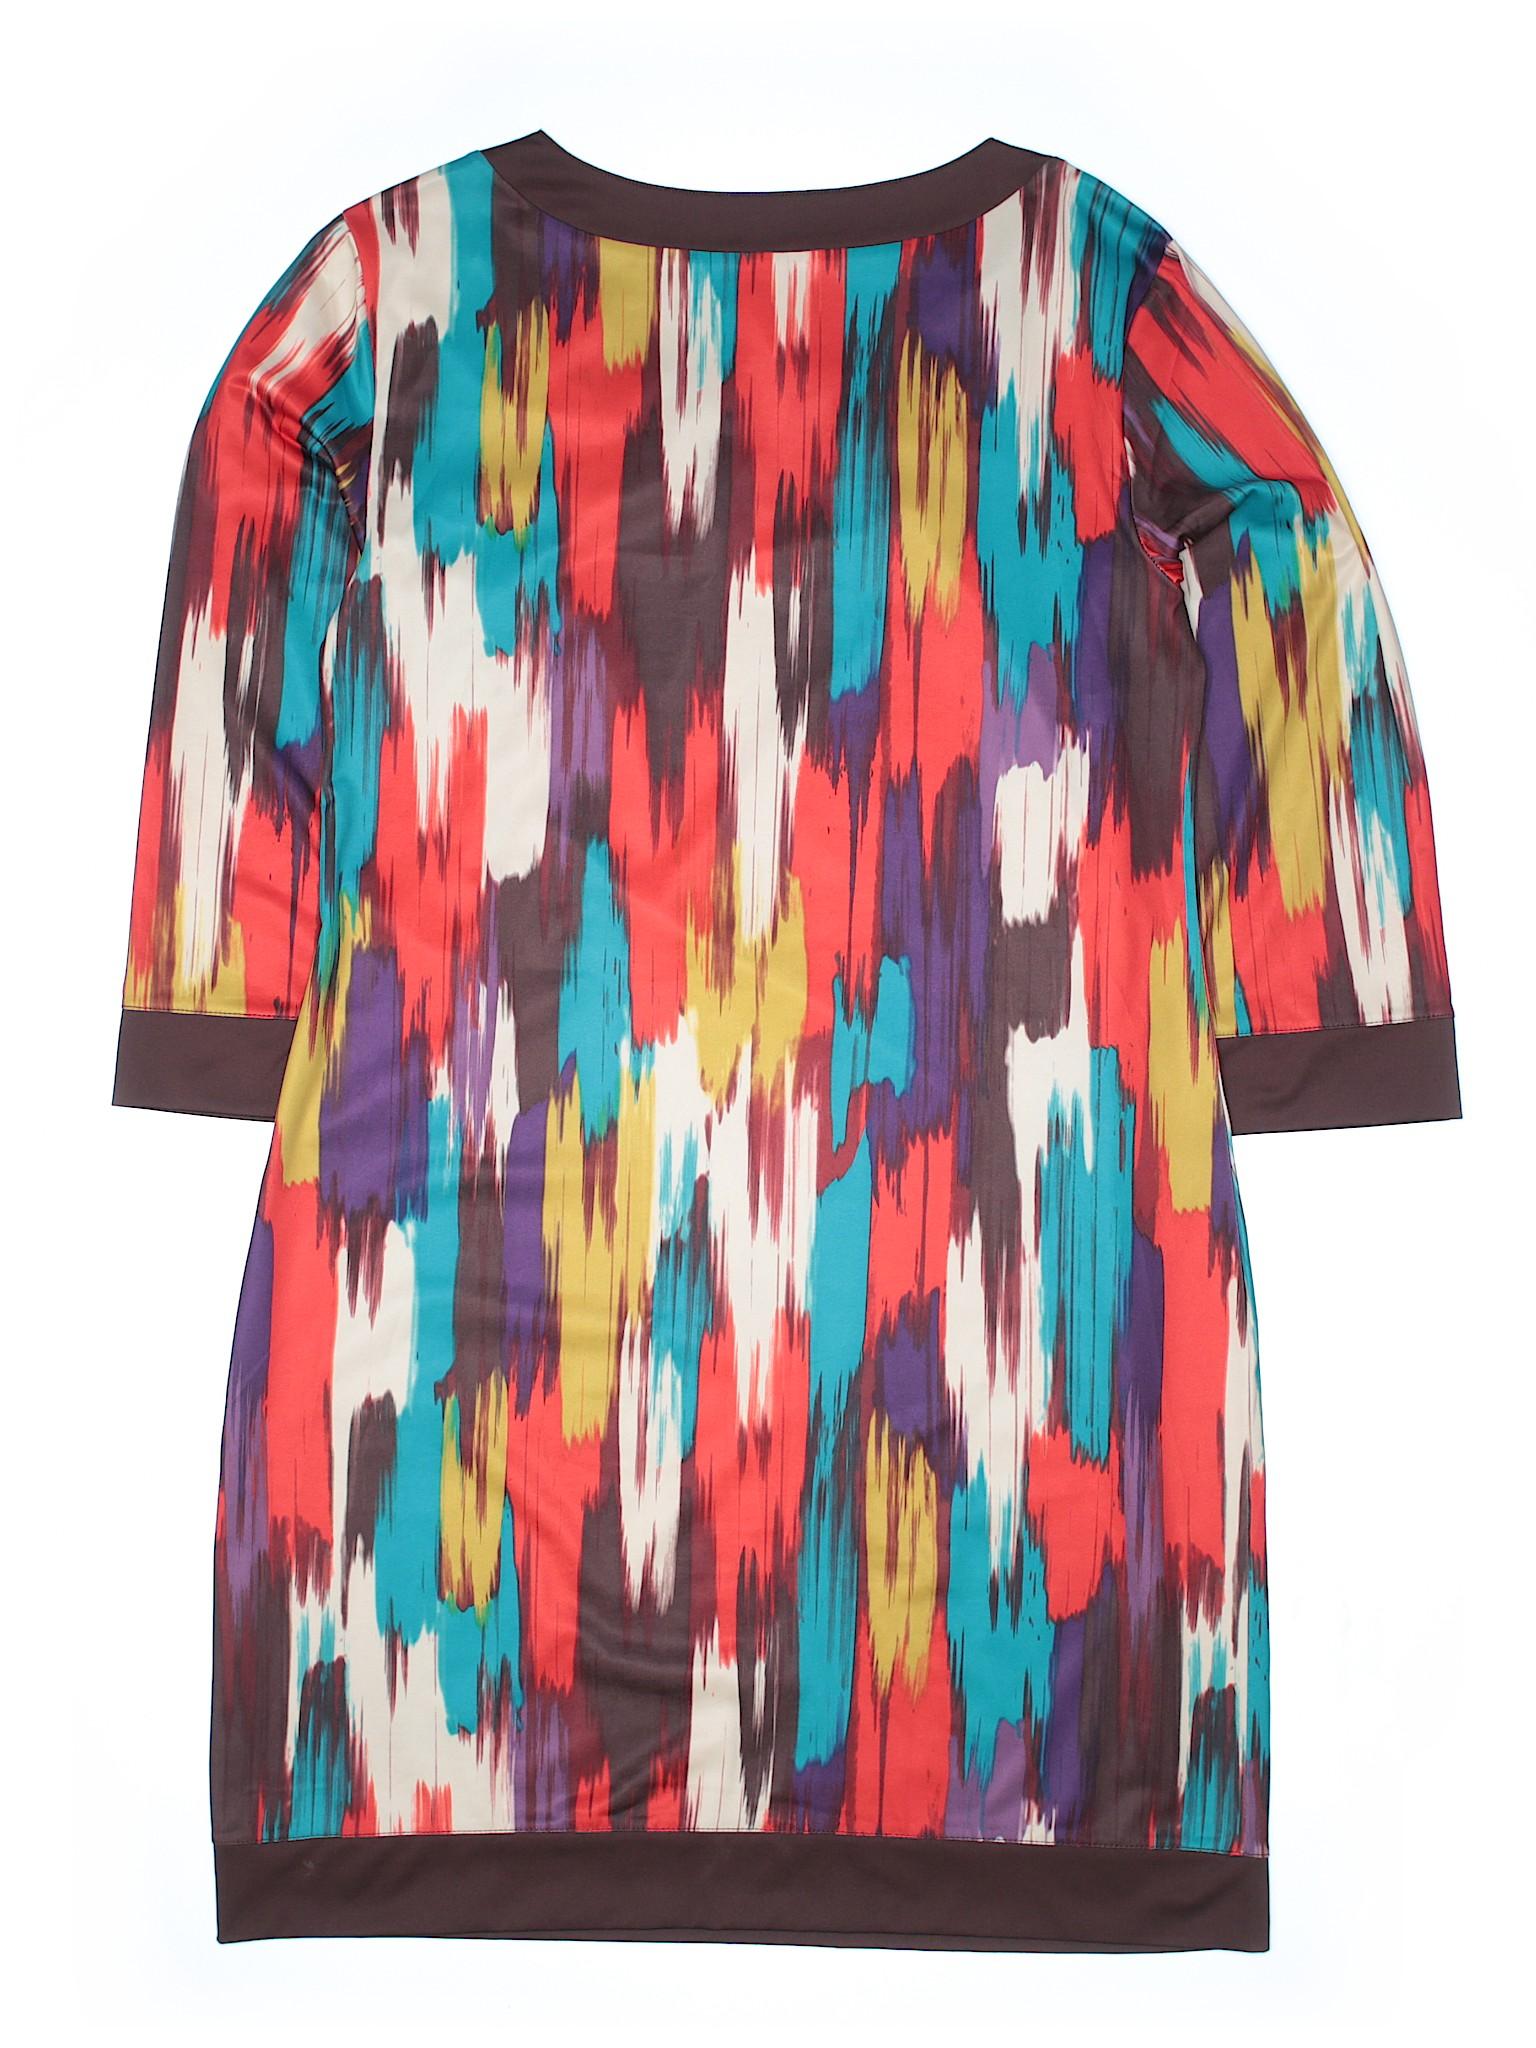 Dress Casual Selling Avon Selling Avon tqwIPWHH